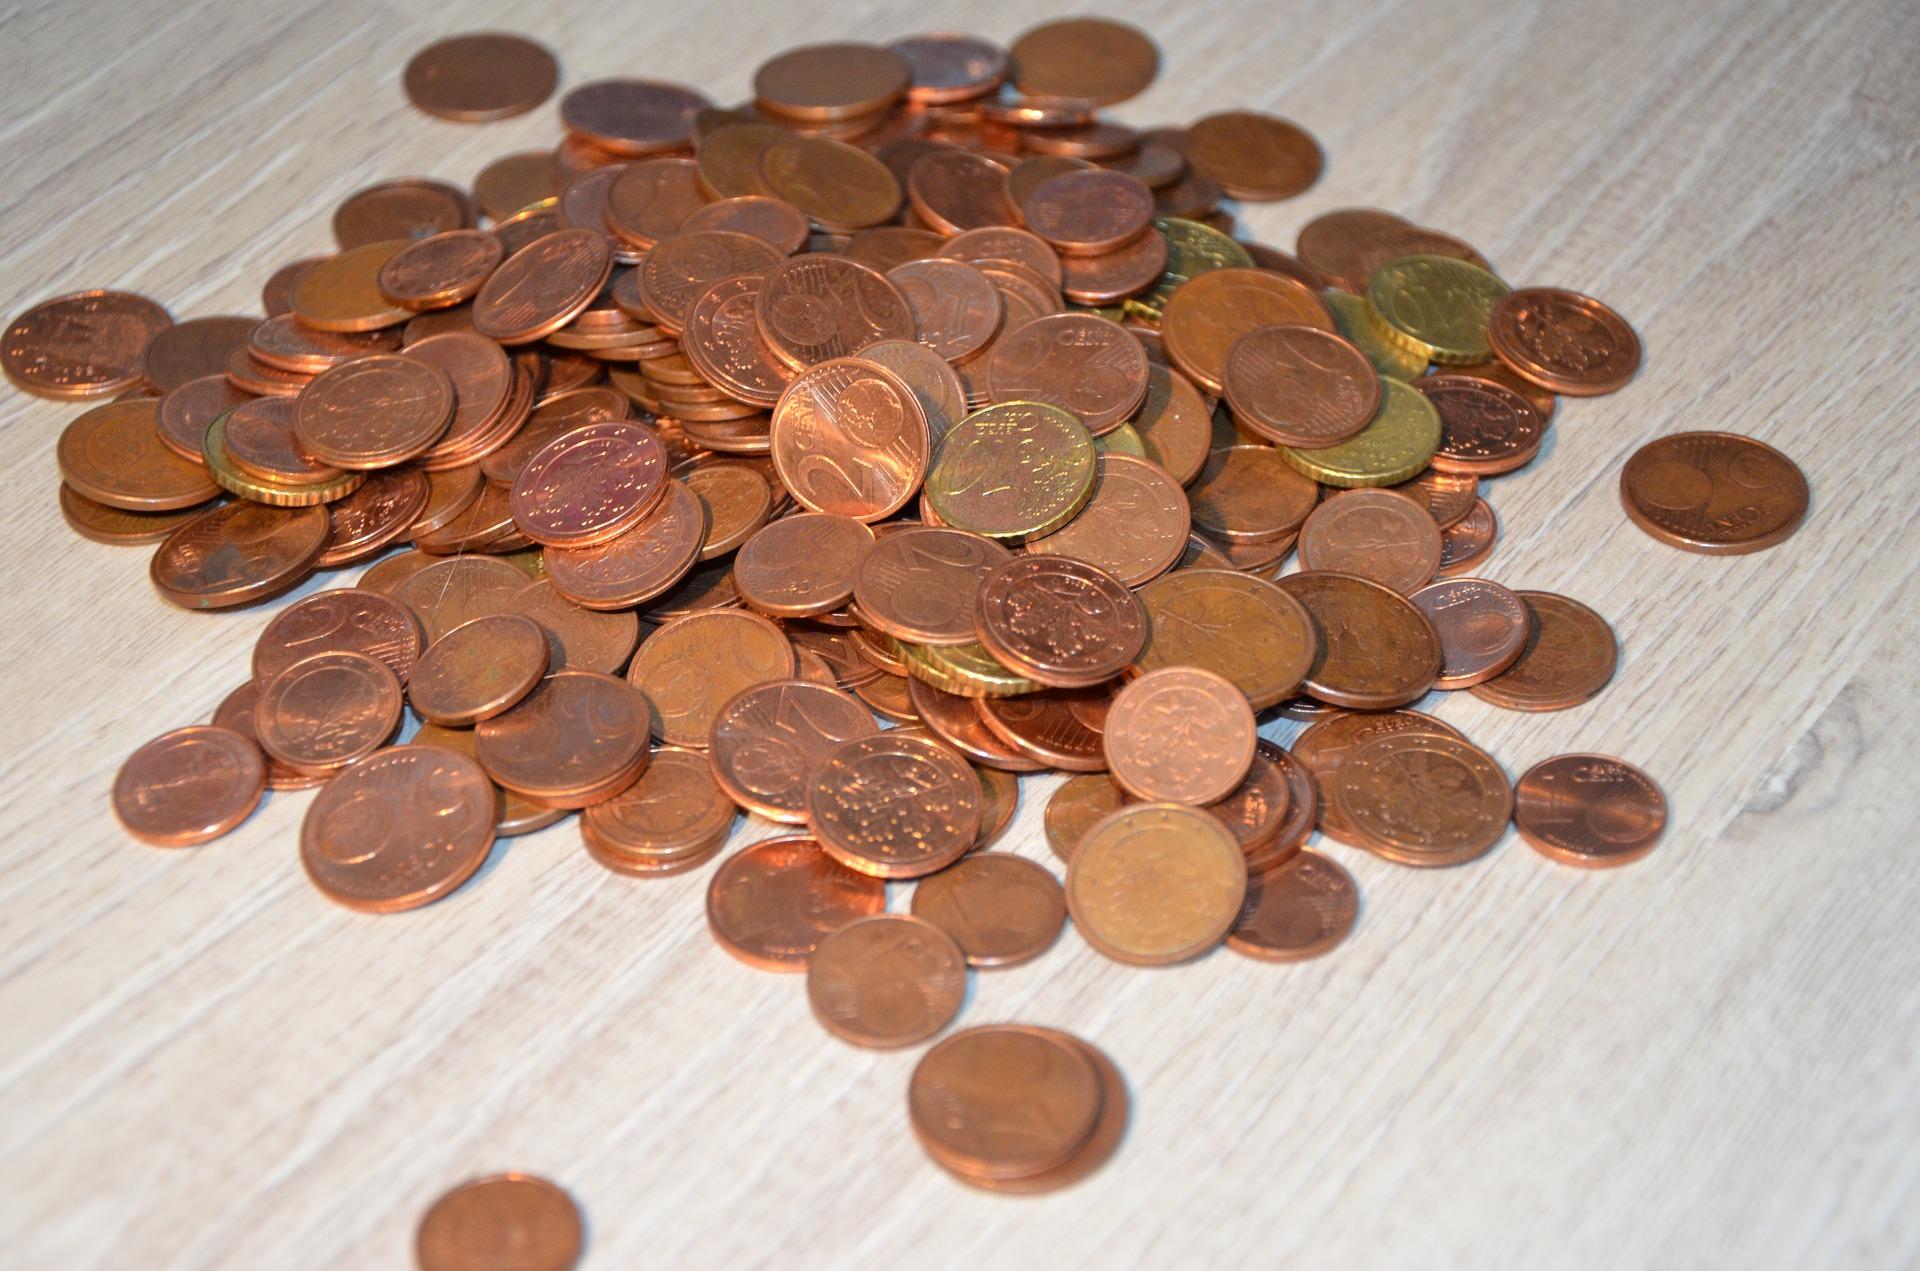 Petite monnaie